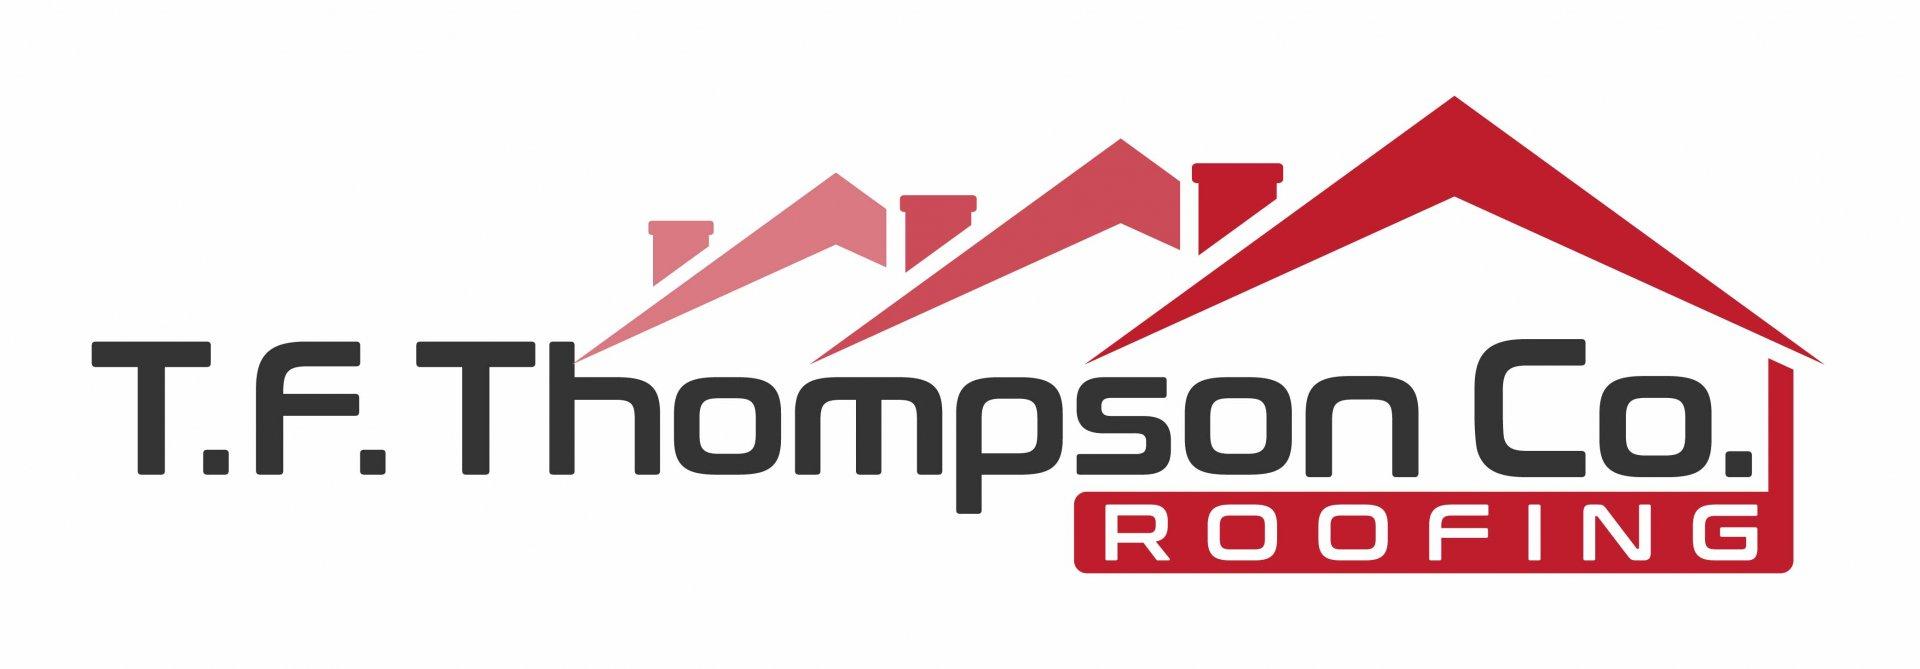 TFThompson Roofing Co logo